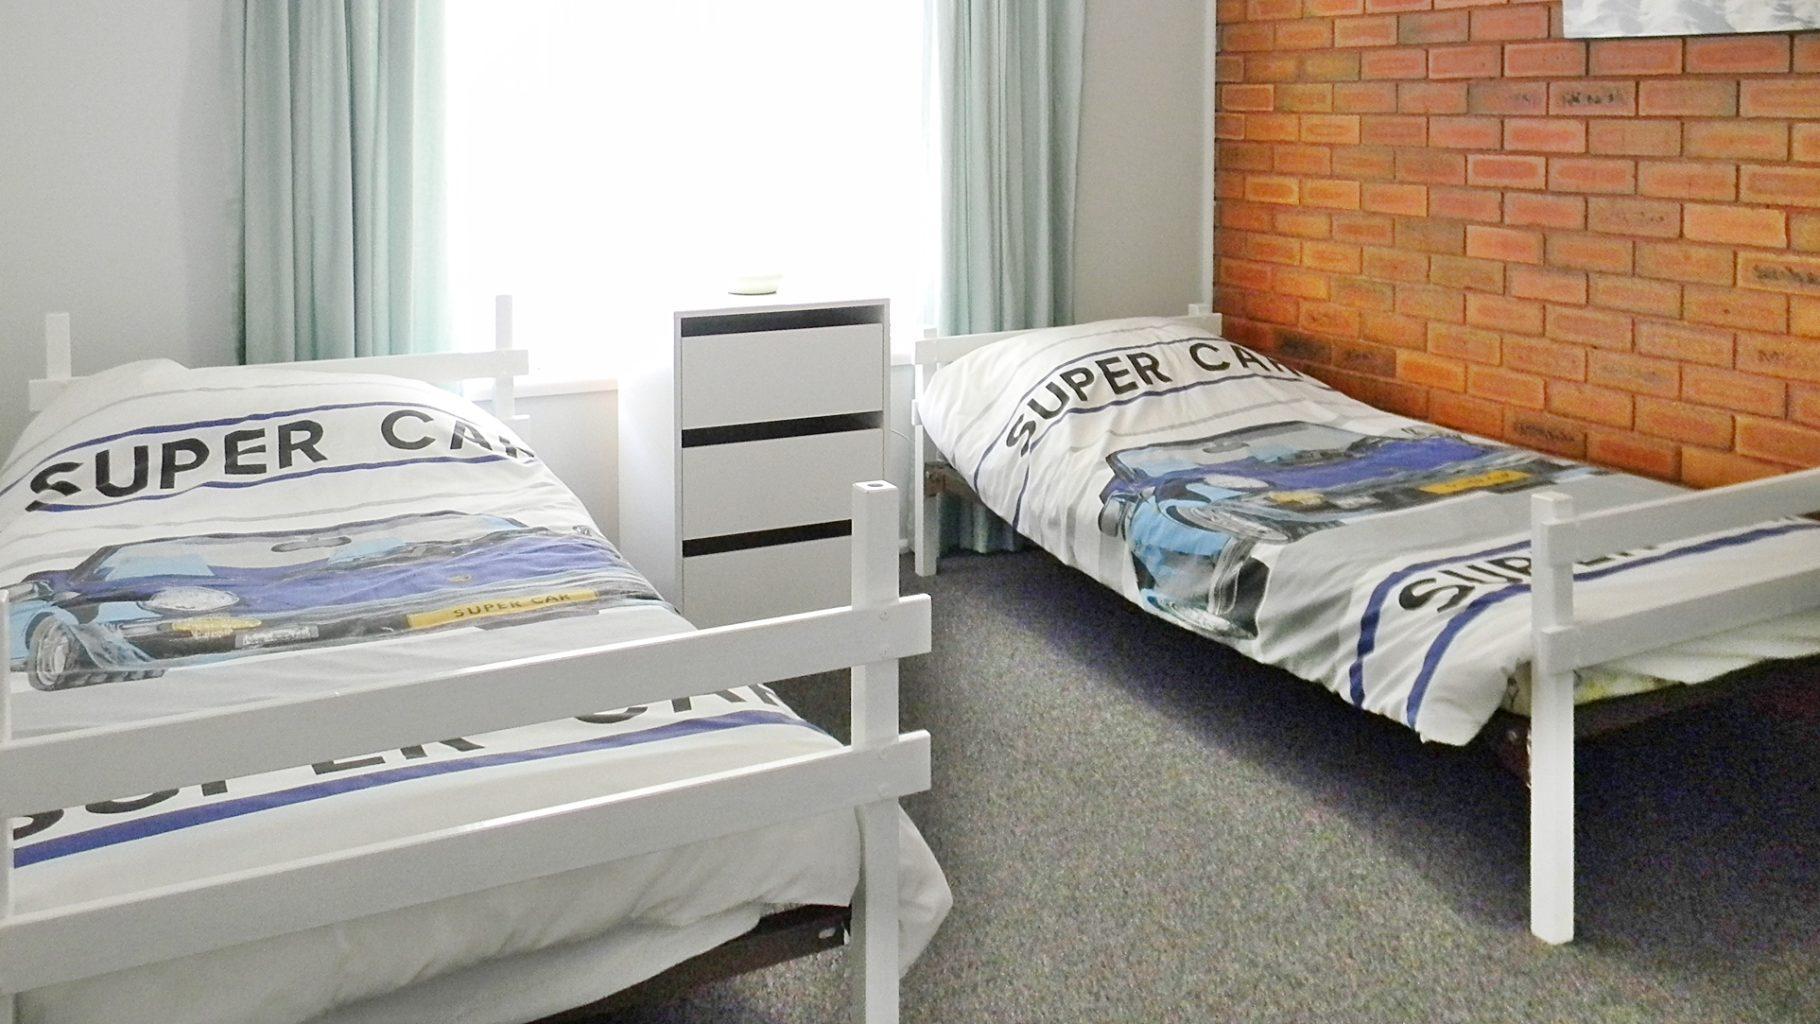 Sunseeker bed 2